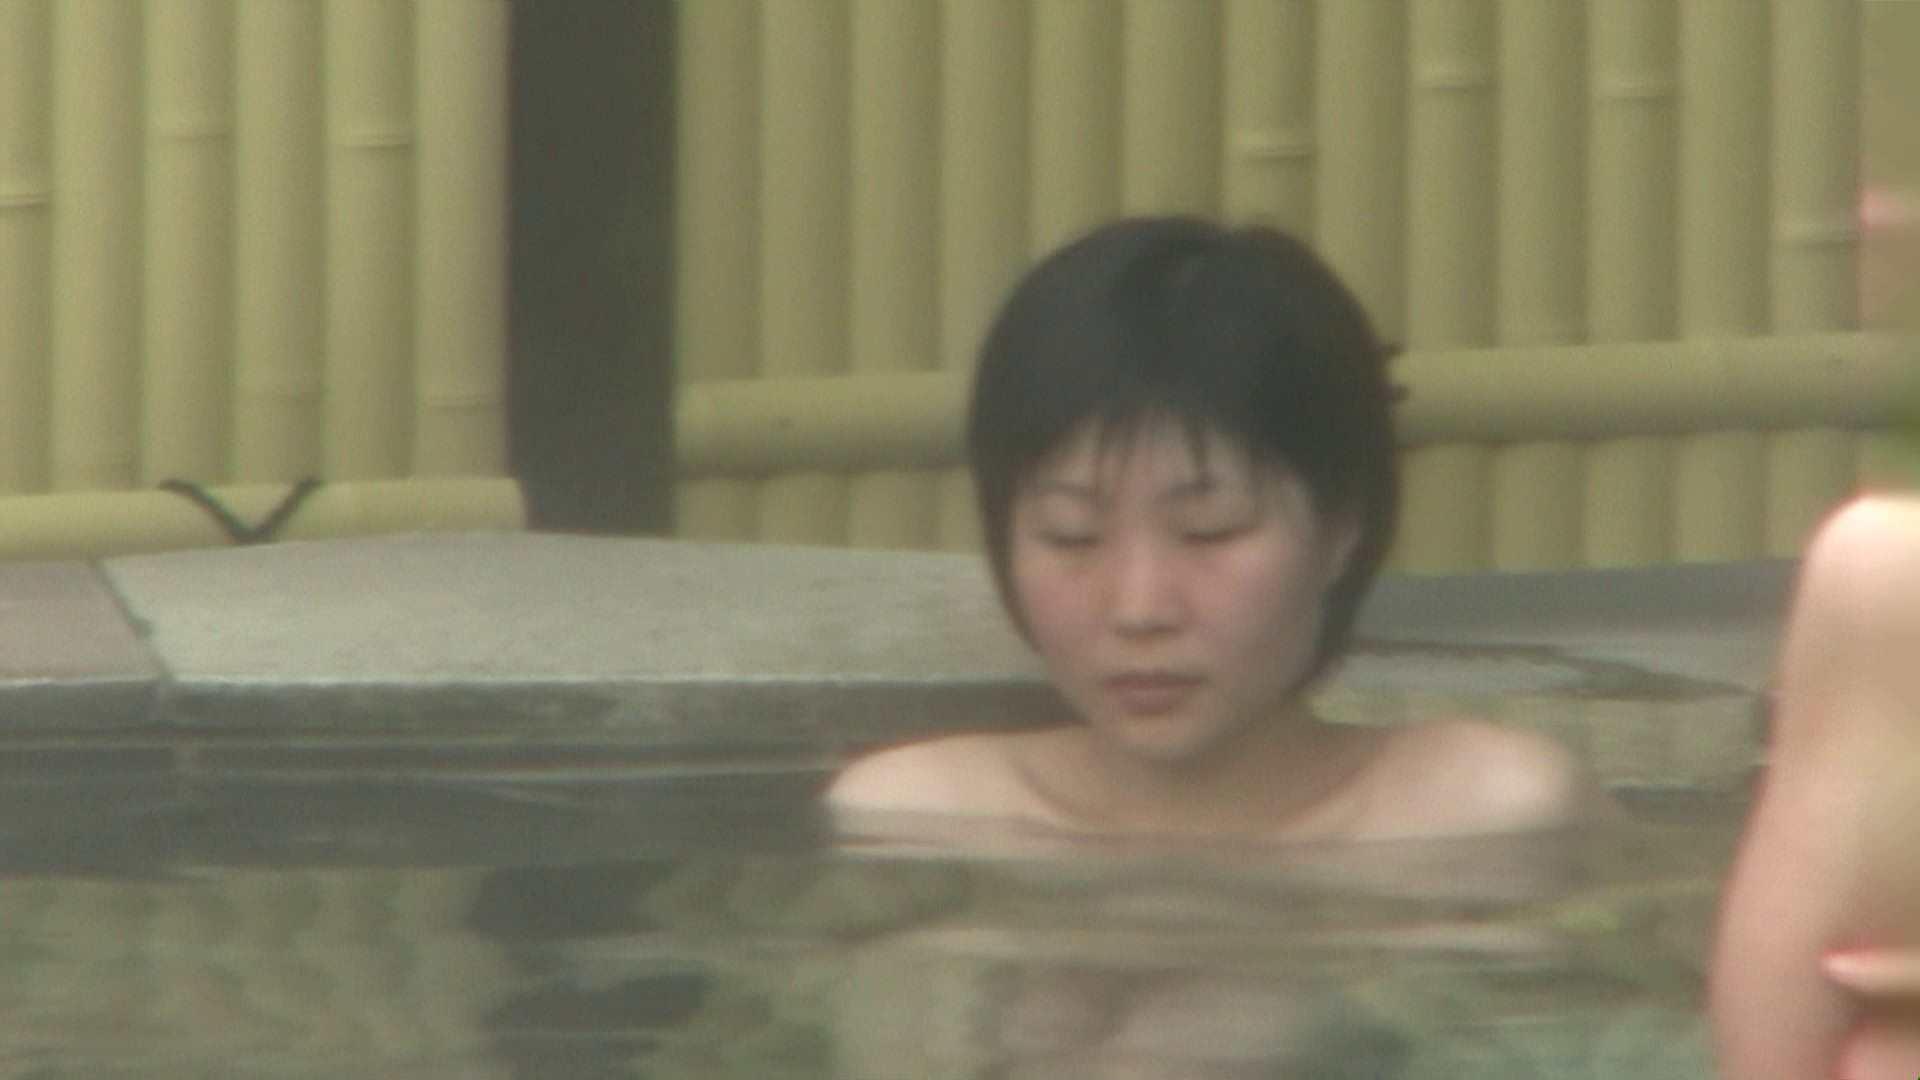 Aquaな露天風呂Vol.74【VIP限定】 露天風呂編 | 盗撮シリーズ  103PIX 77